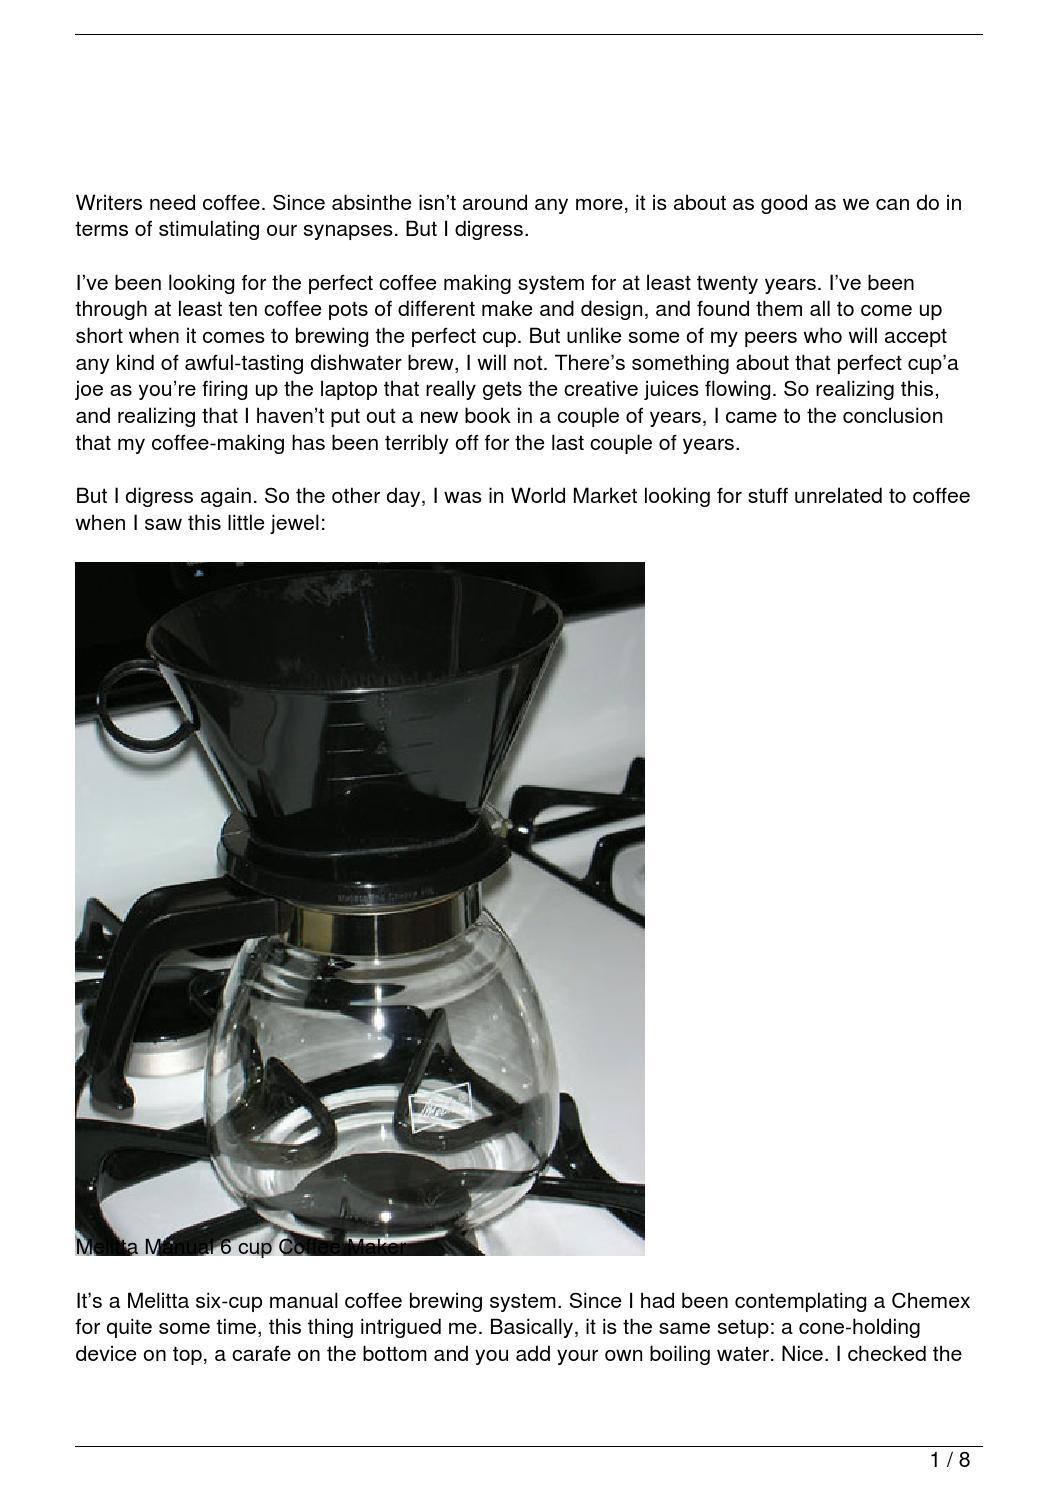 Manual Coffee Maker N1 : The Melitta Manual 6-cup Coffee Maker by Le Trung Nghia - issuu